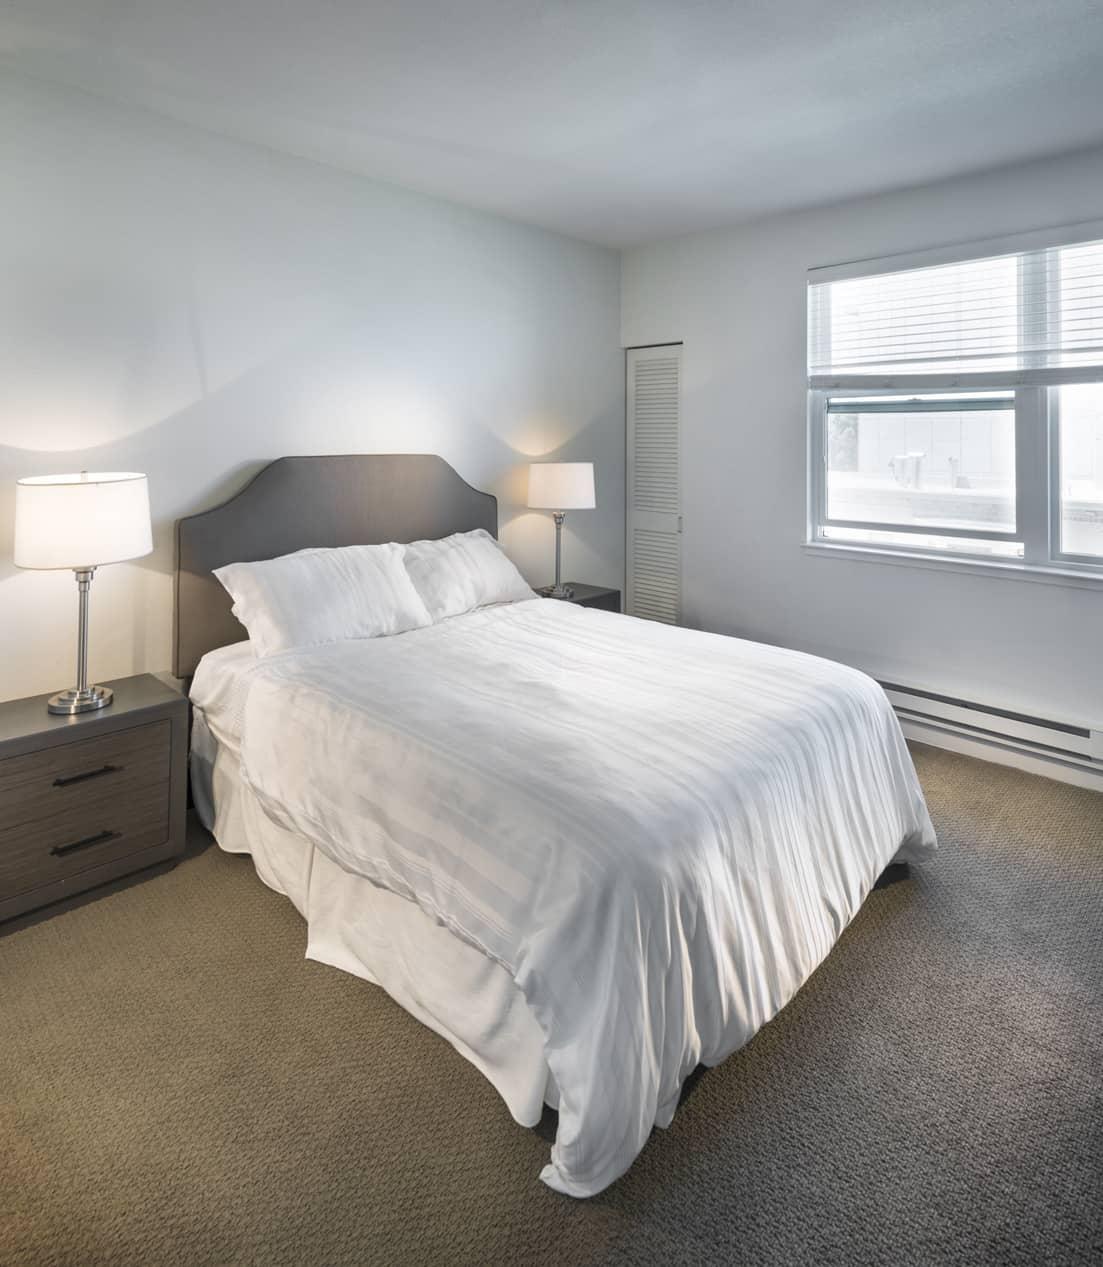 Bedroom at 2000 Post Apartments